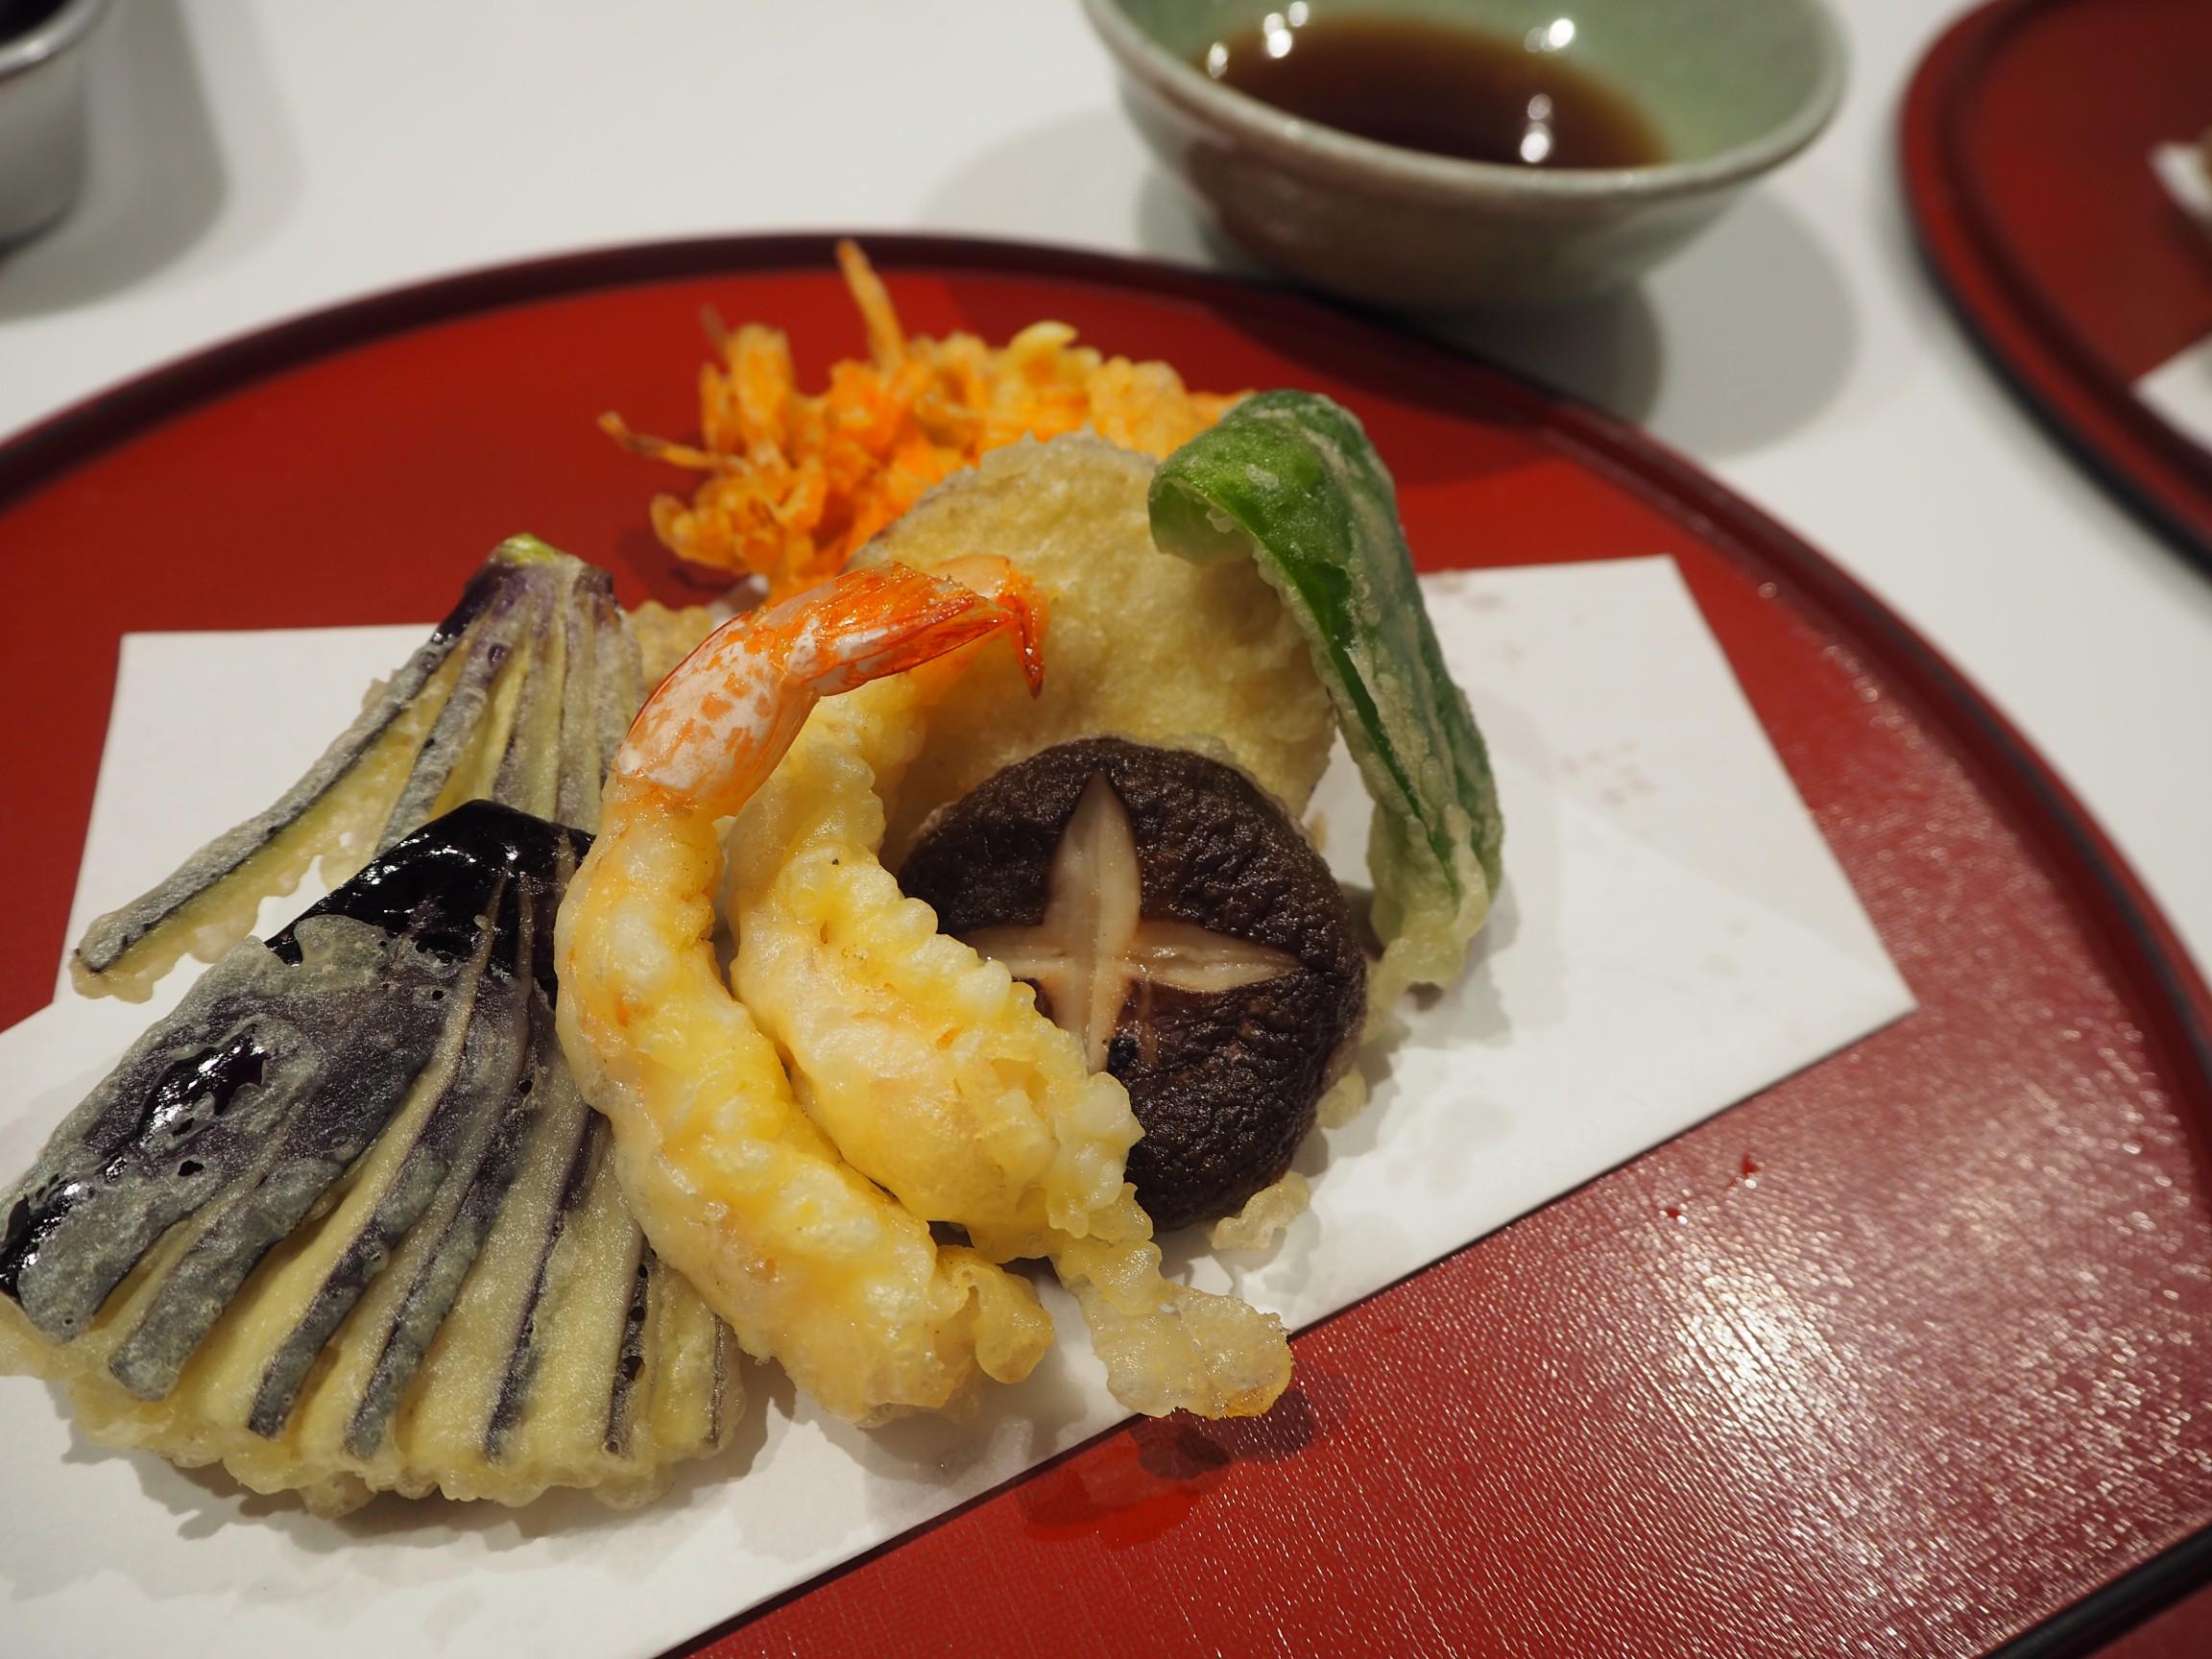 [AM] Tempura Cooking Class in Marunouchi or Nihonbashi